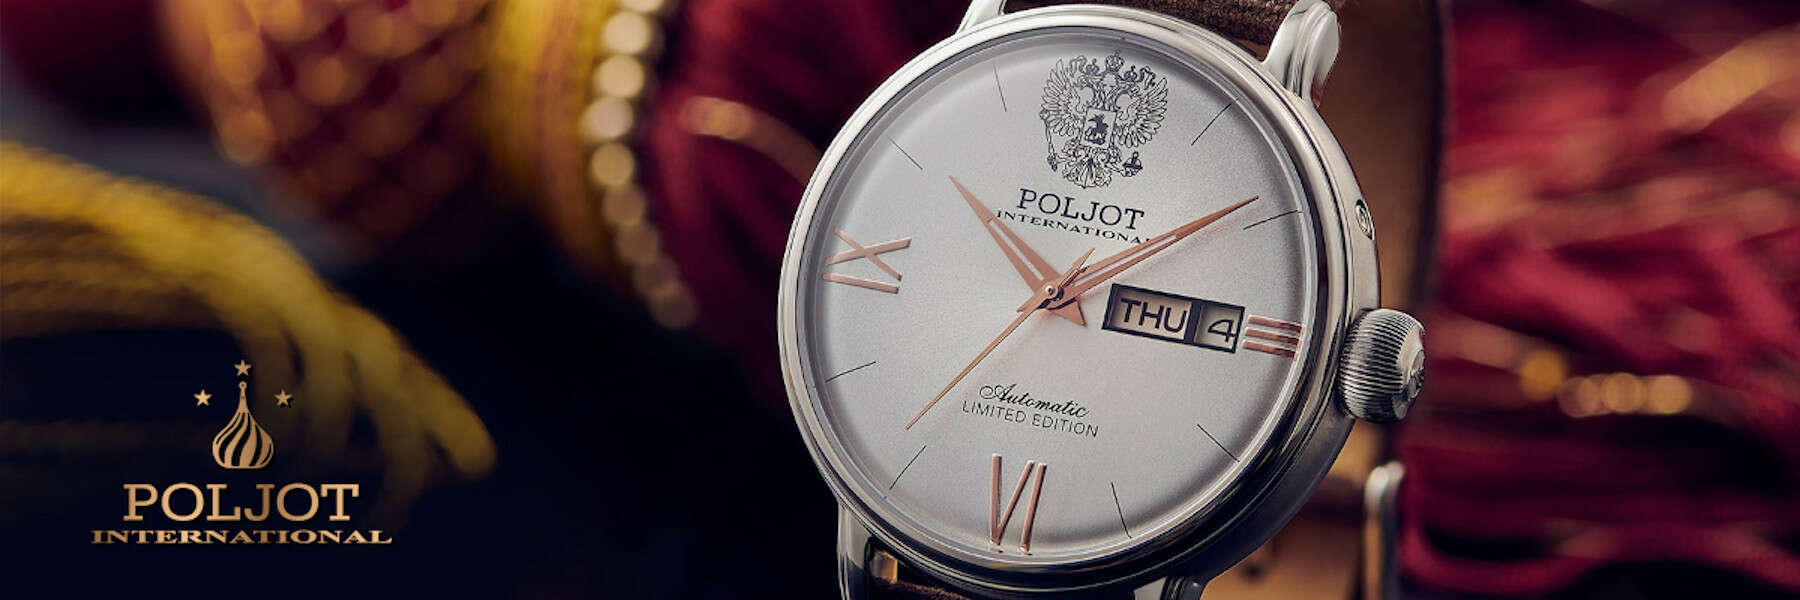 Uhren Daniel Heckmann - Poljot International